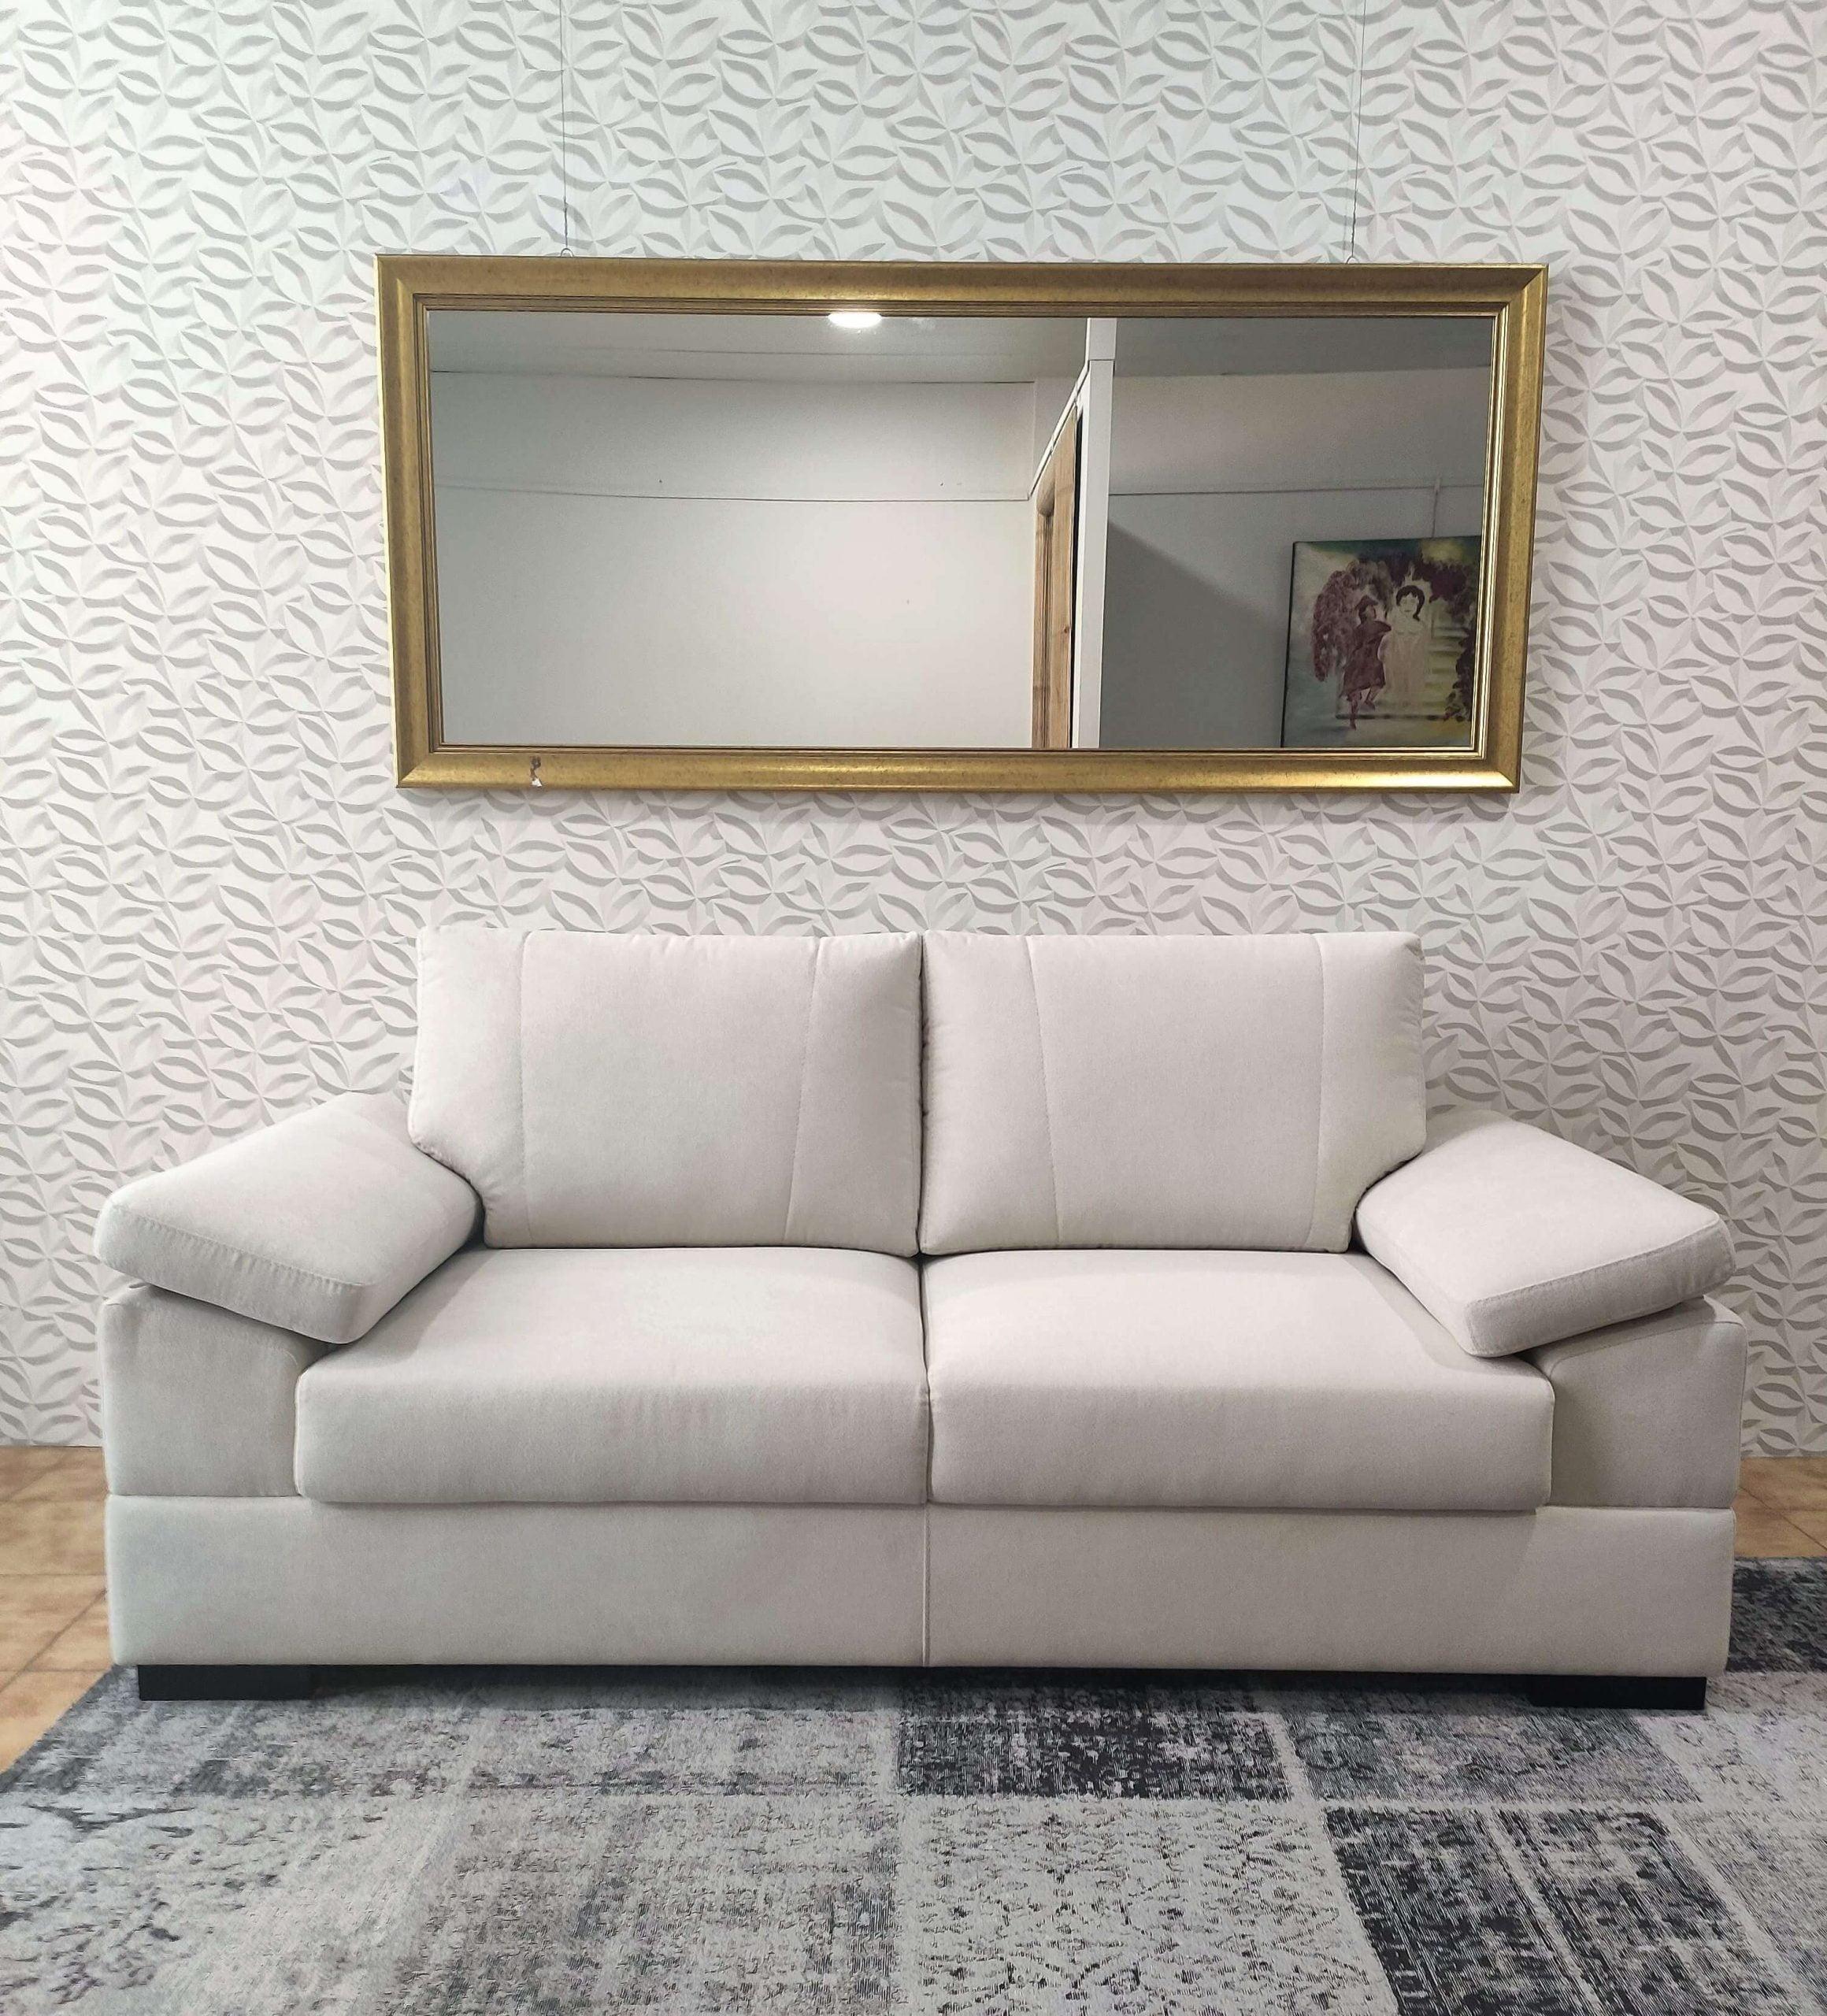 Sofa de 2 Lugares Tecido Branco Lisboa 1 scaled